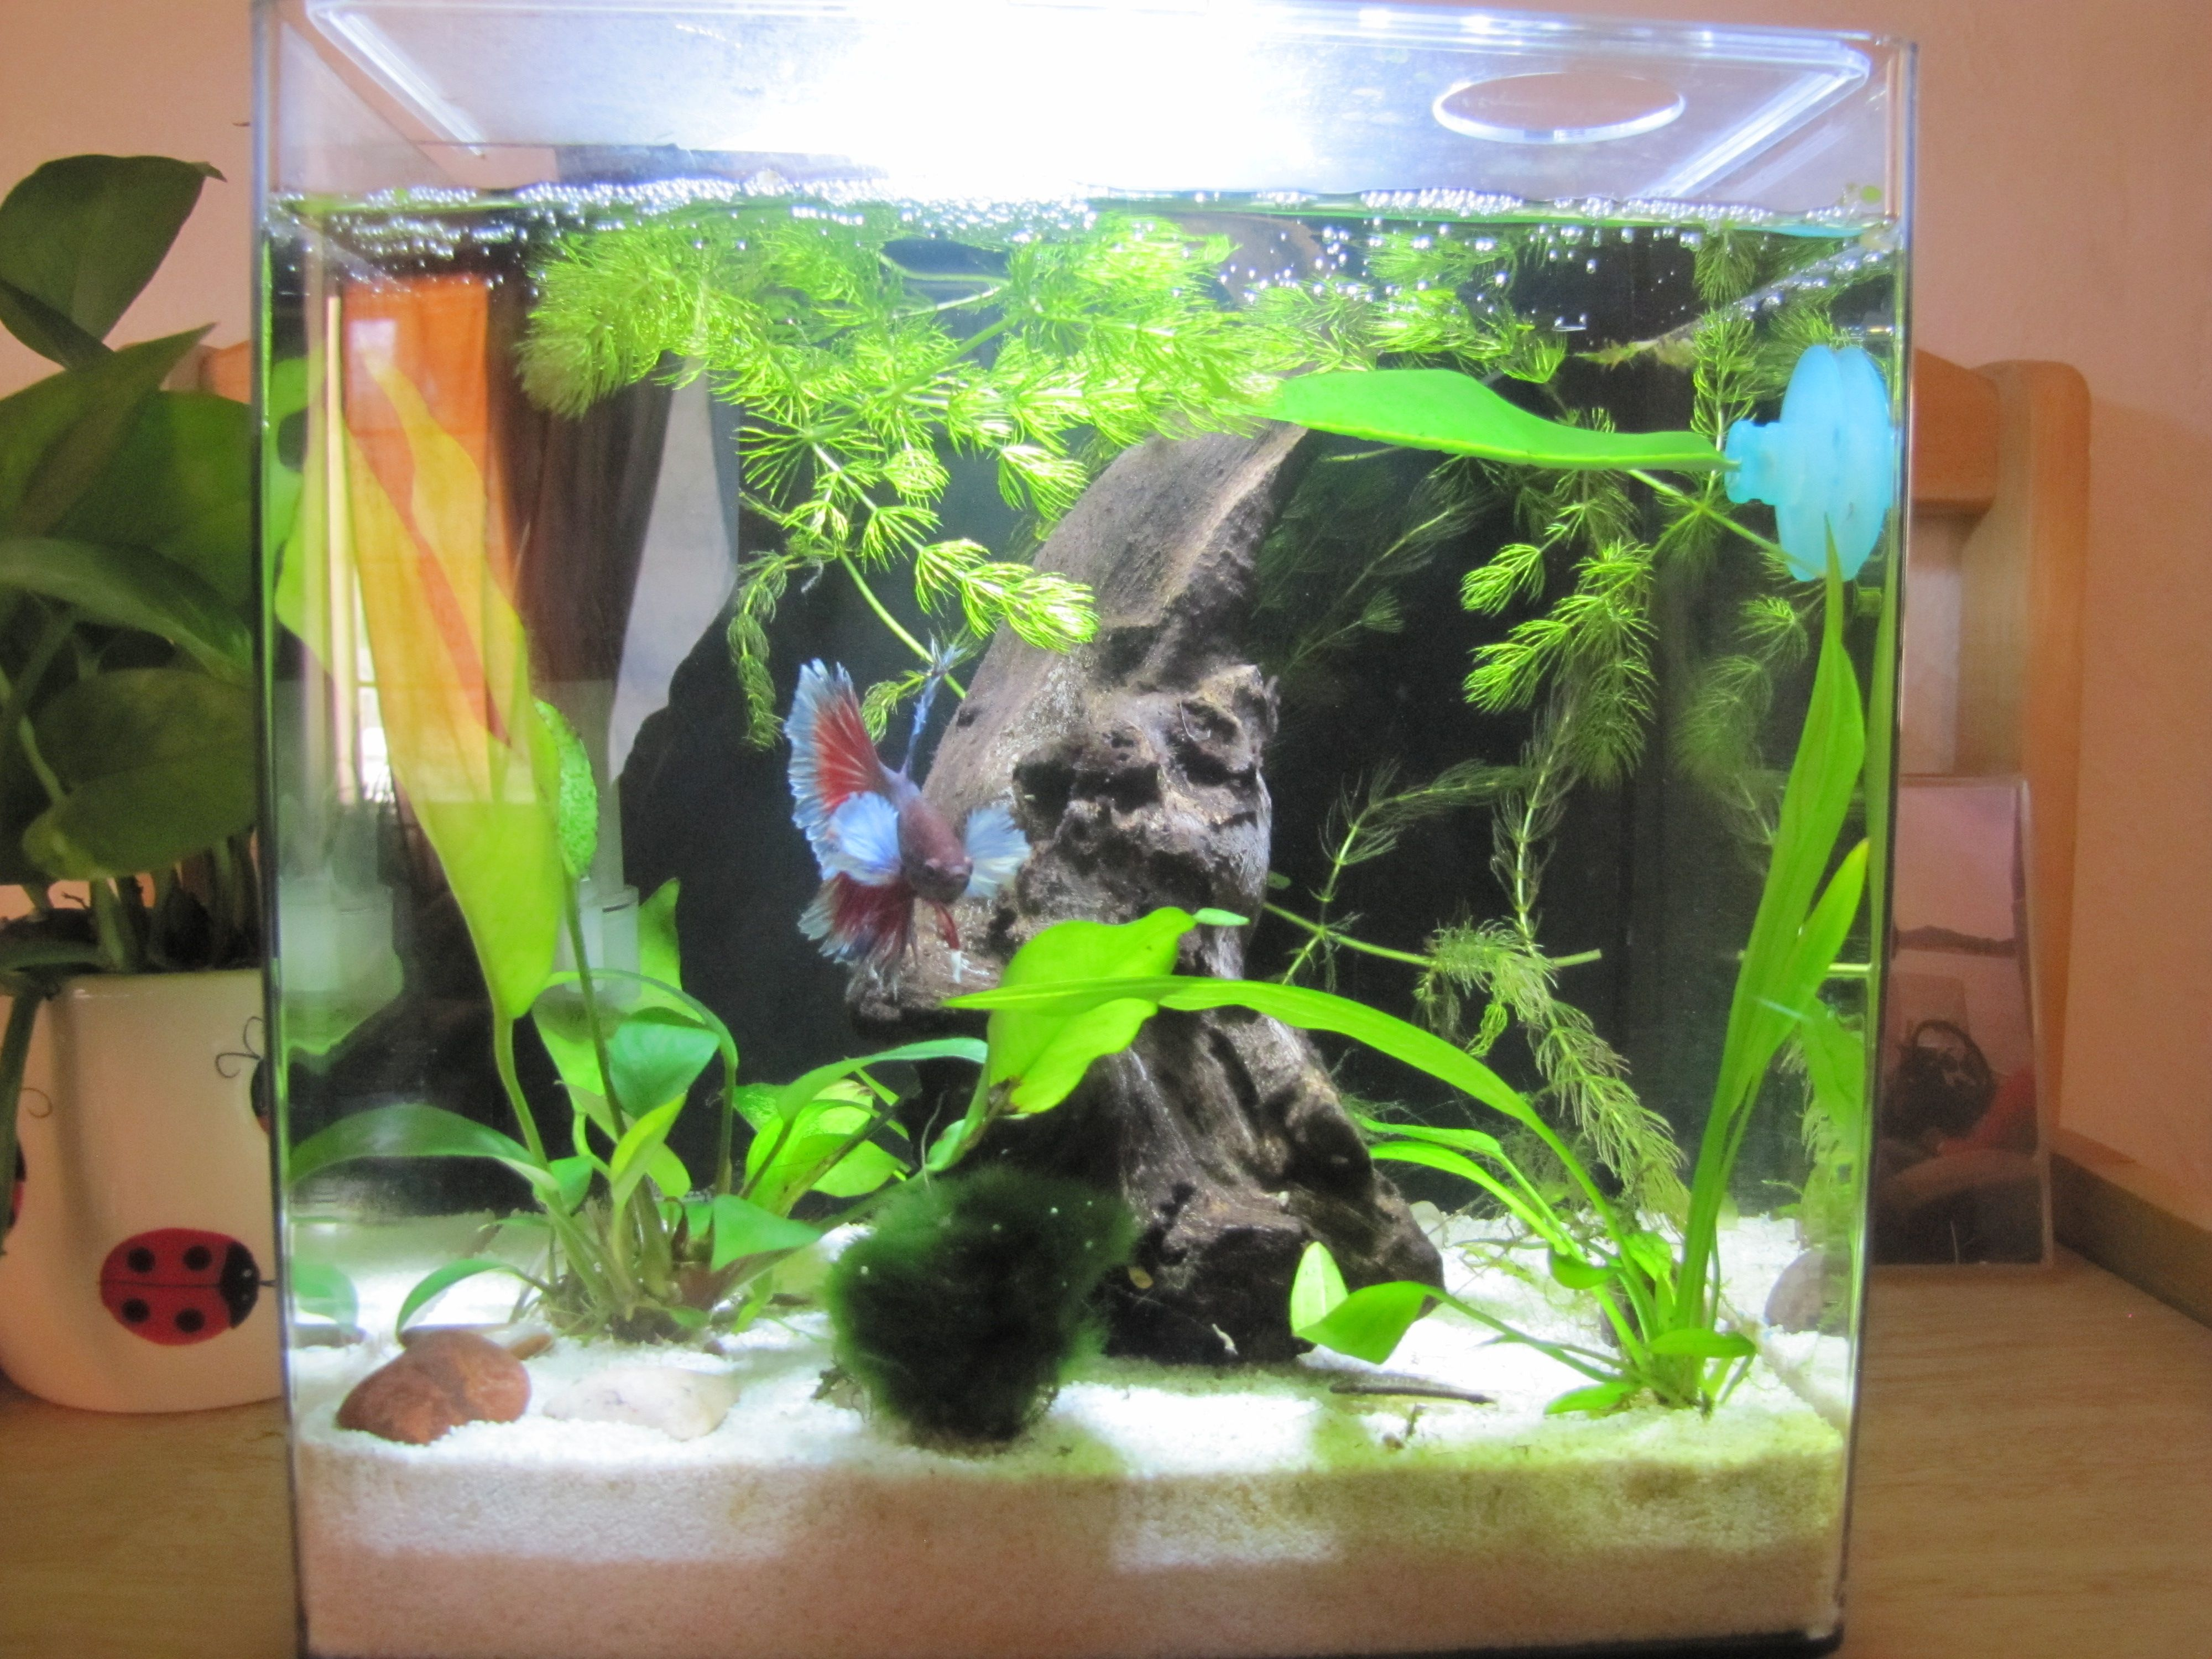 Betta than a bowl betta fish aquariums betta tank for Betta fish moss ball